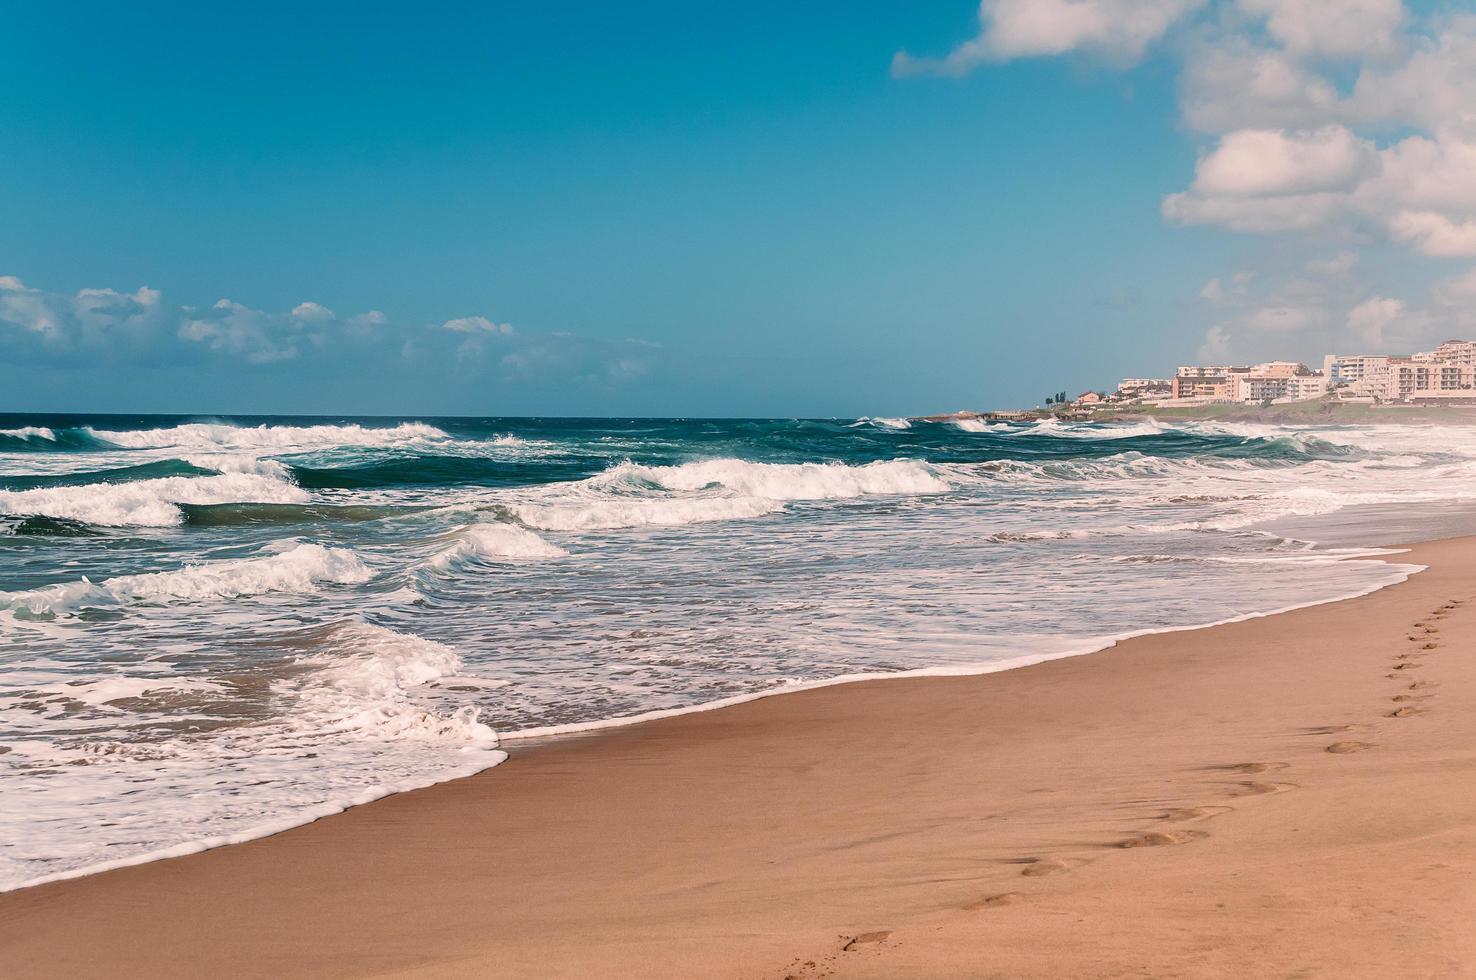 paradis ocean beach, fotavtryck i våt sand, avlägsna hotell foto